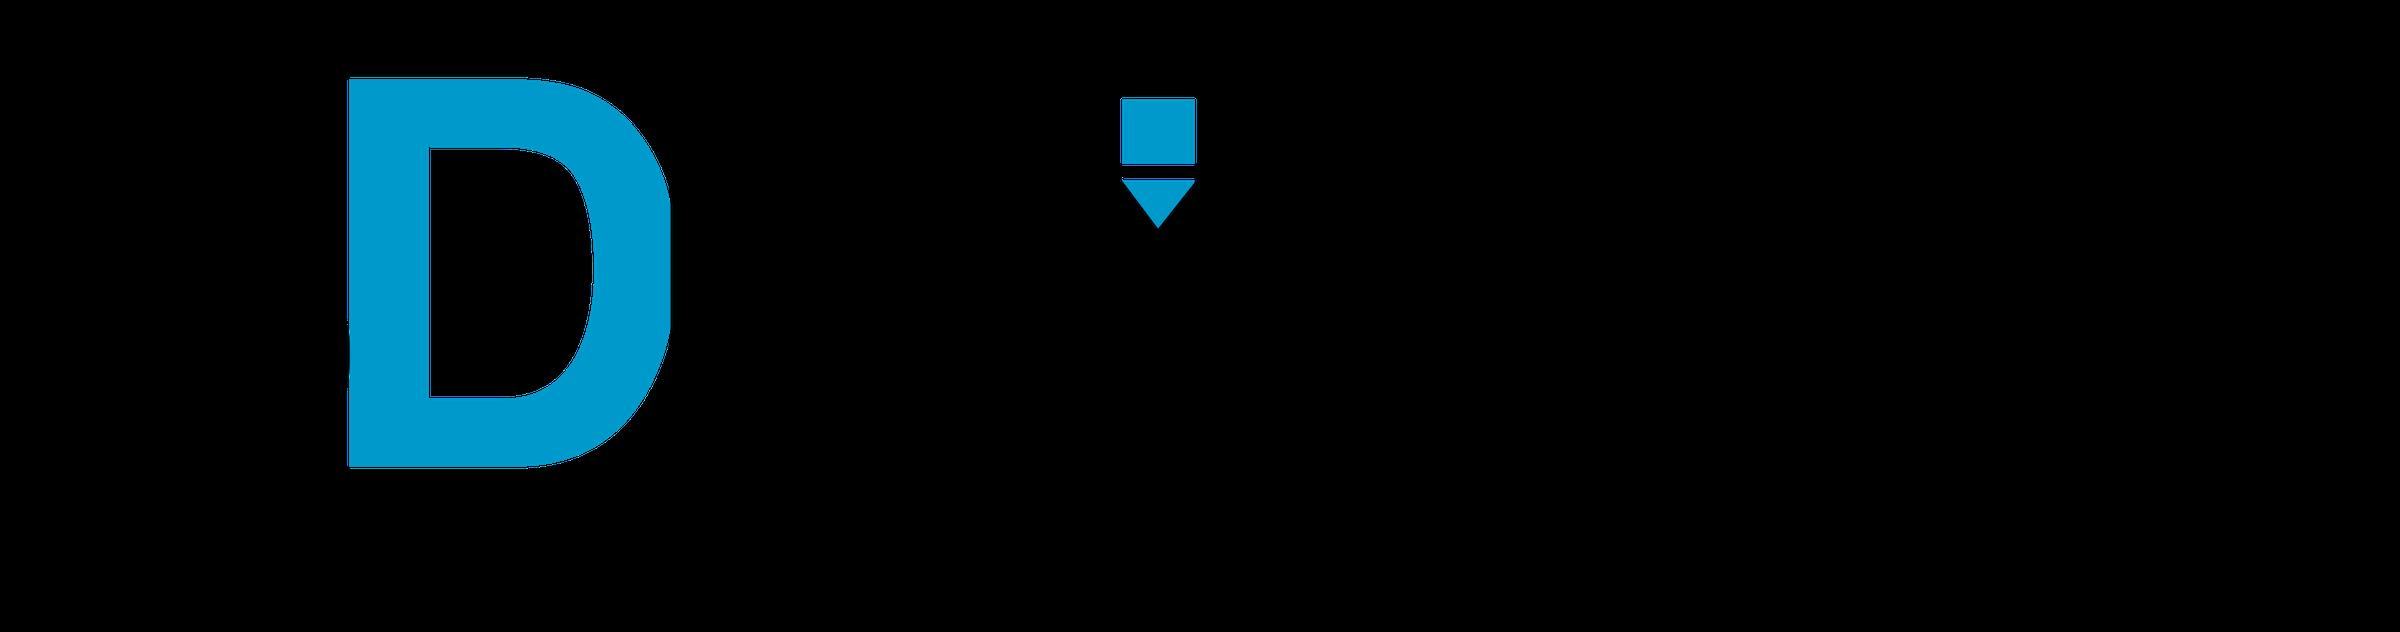 3Dprint.pe logo